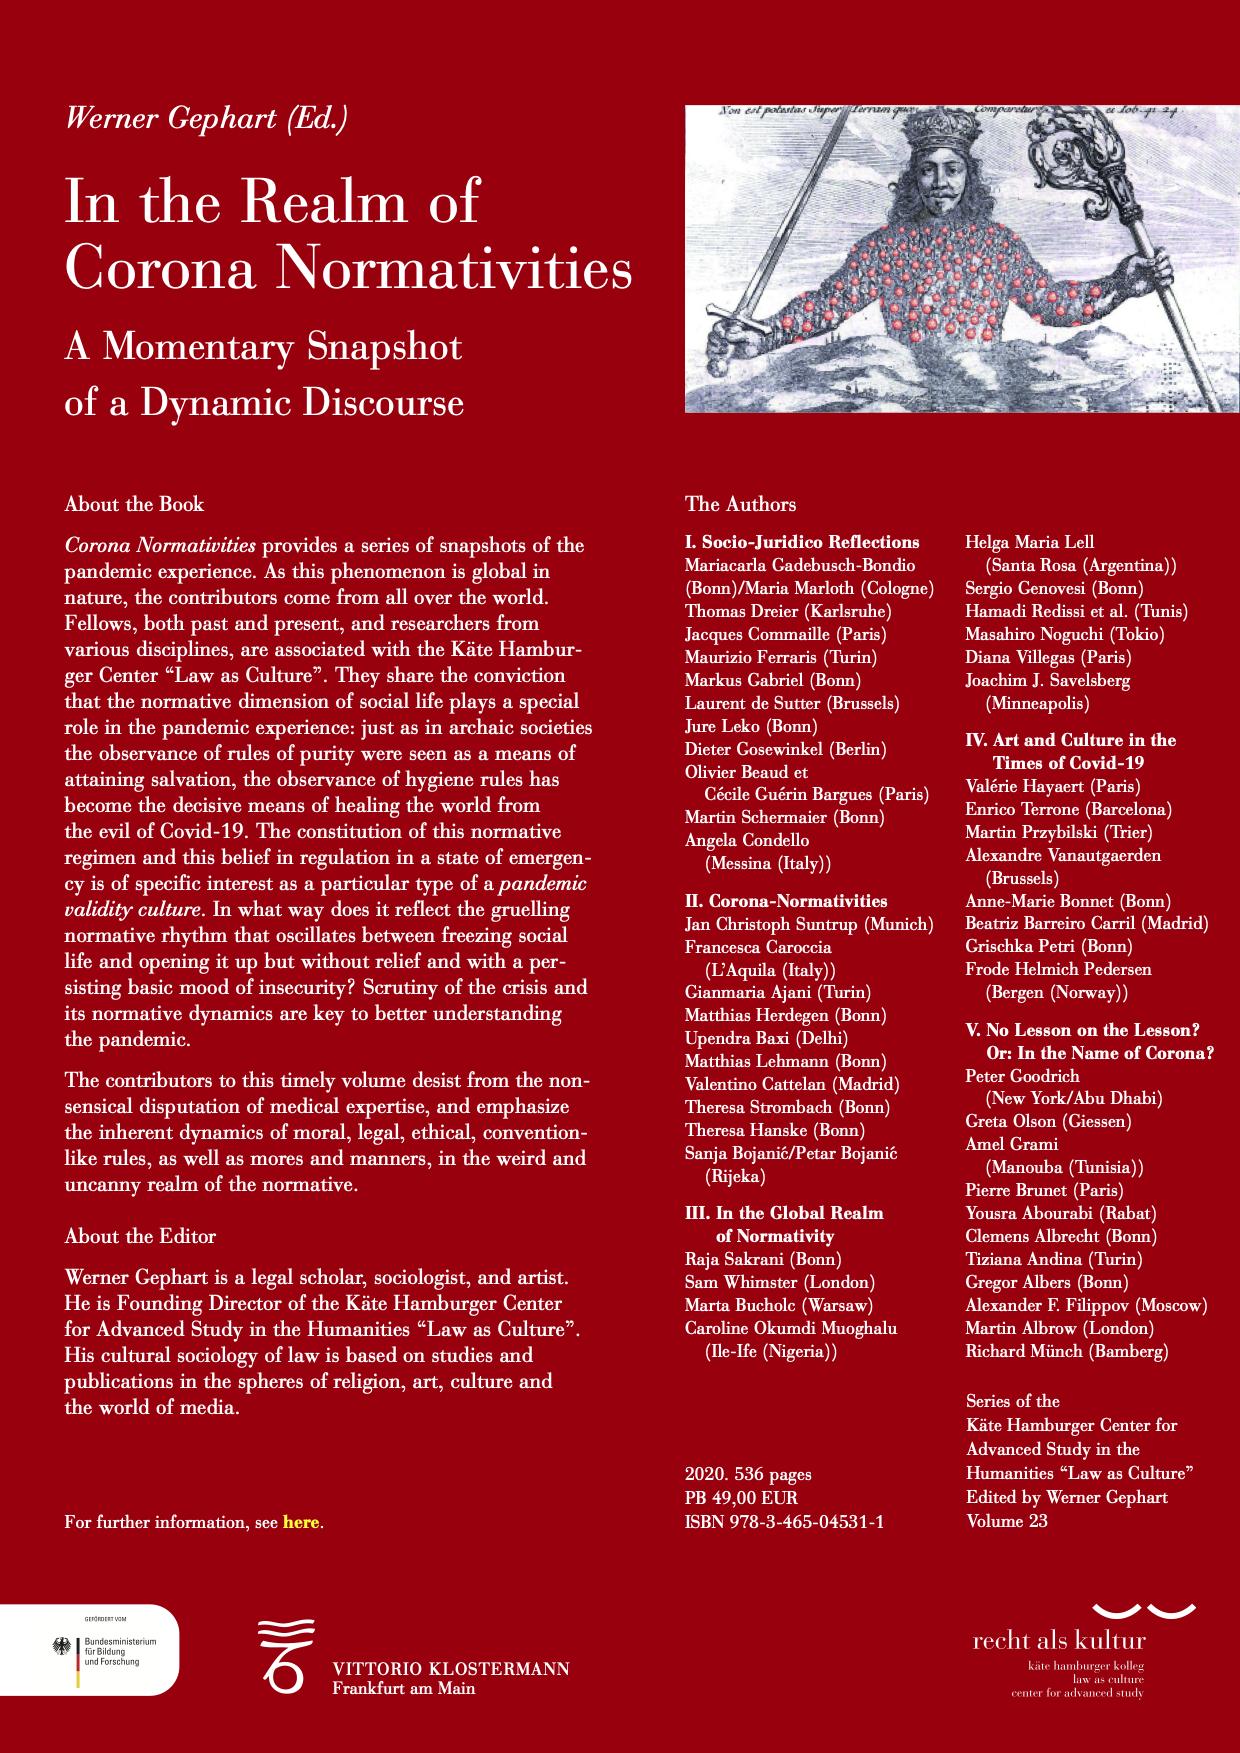 Flyer_Corona Normativities_Volume 23 (ed. by W. Gephart)